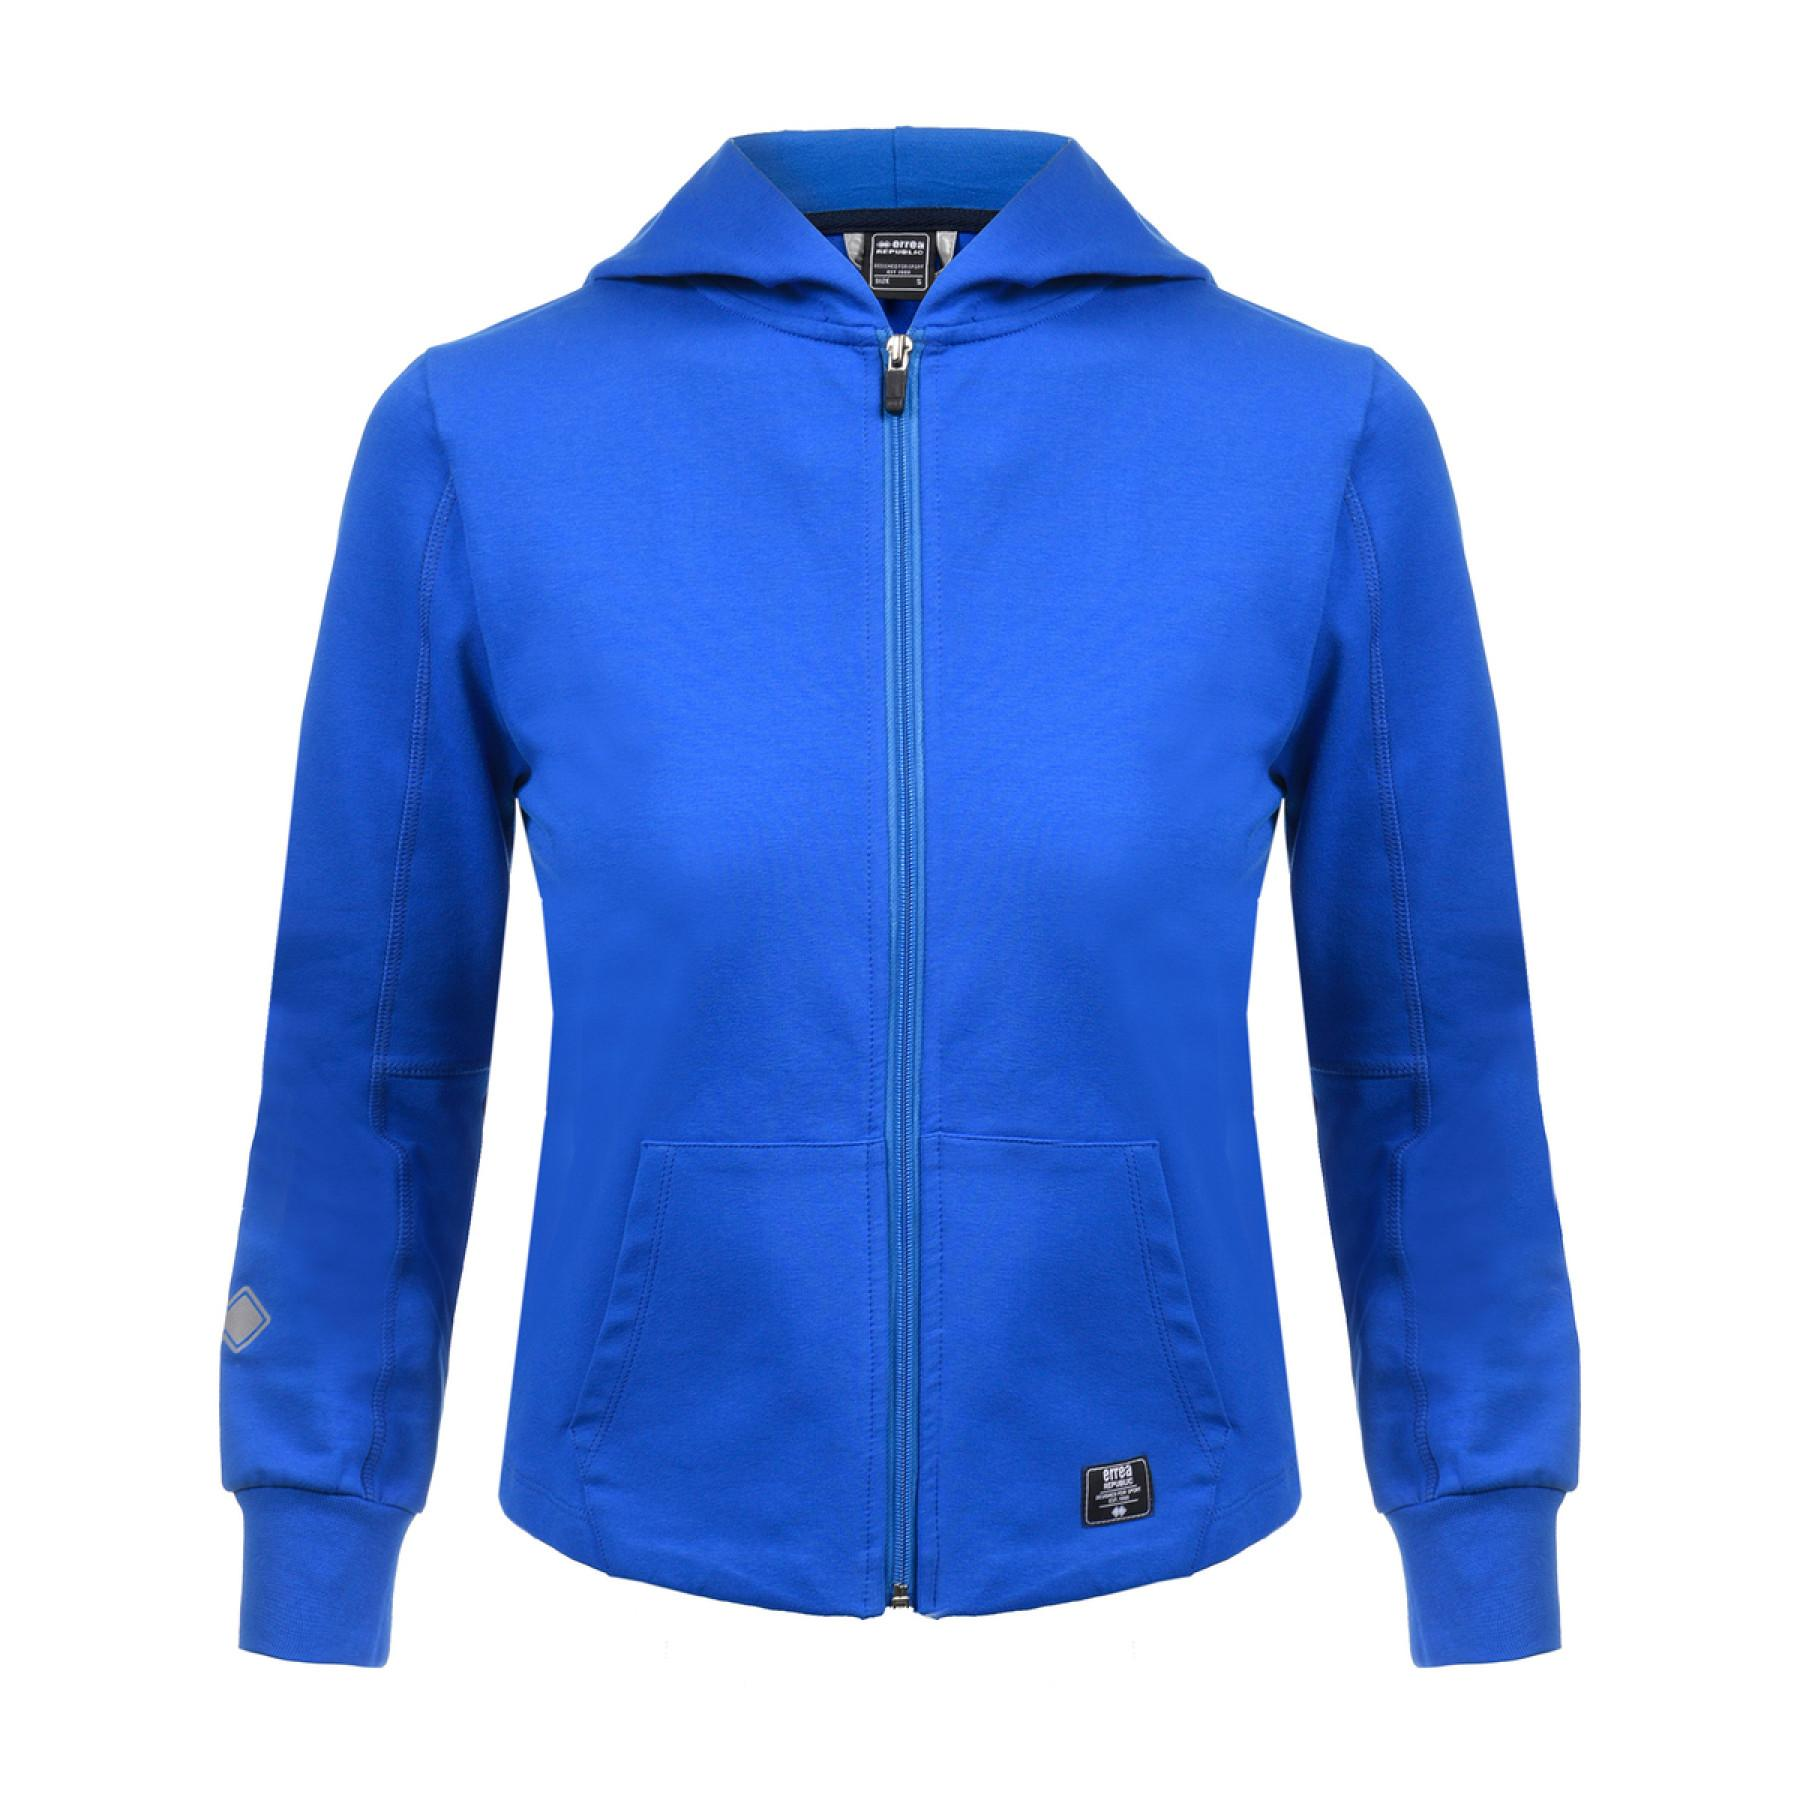 Full zip jacket woman Errea contemporary fleece